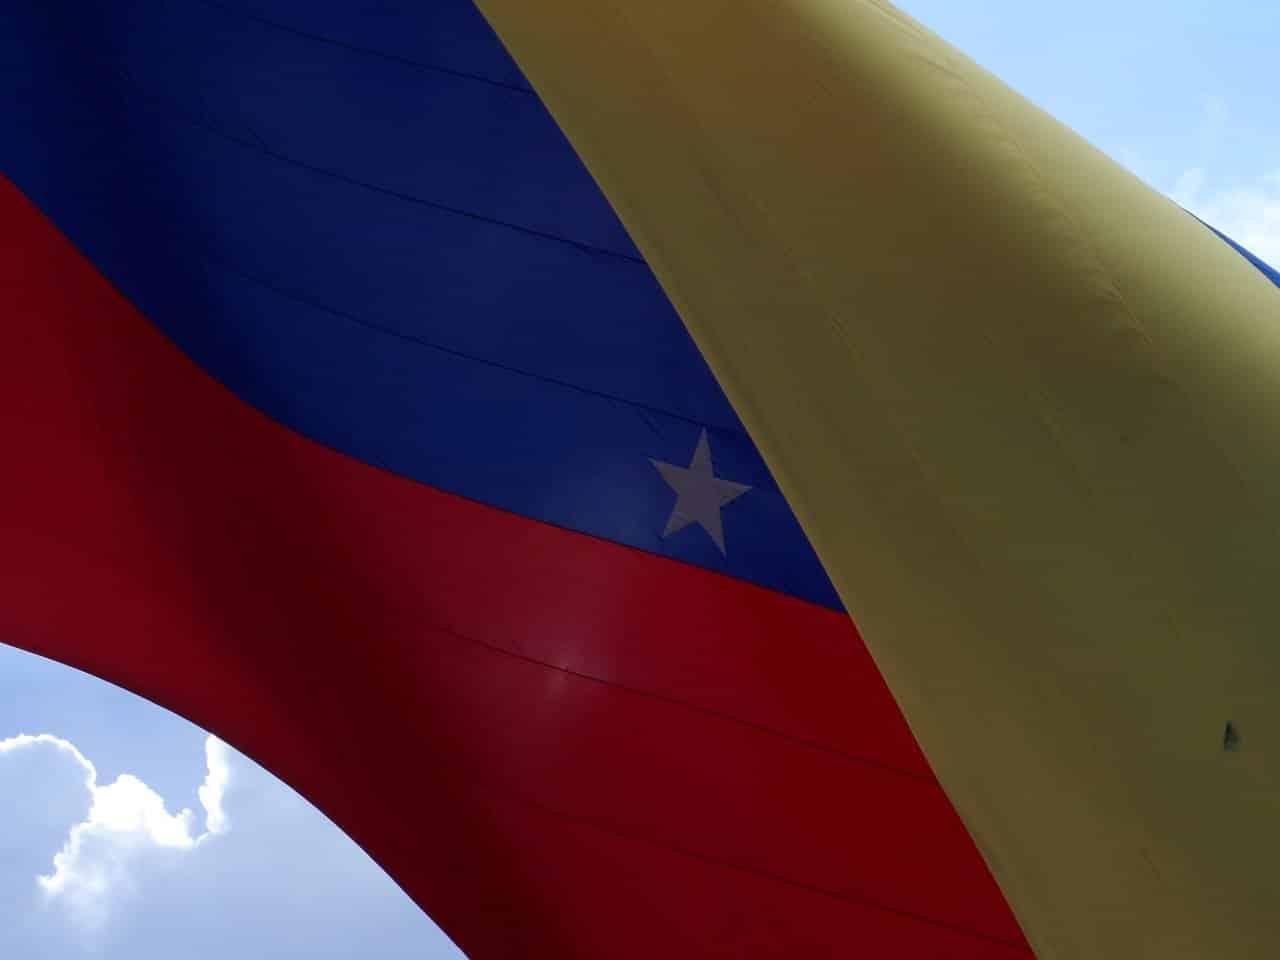 venezuela-madura-petro-criptomoeda-bitcoin-dash-carteira-economia